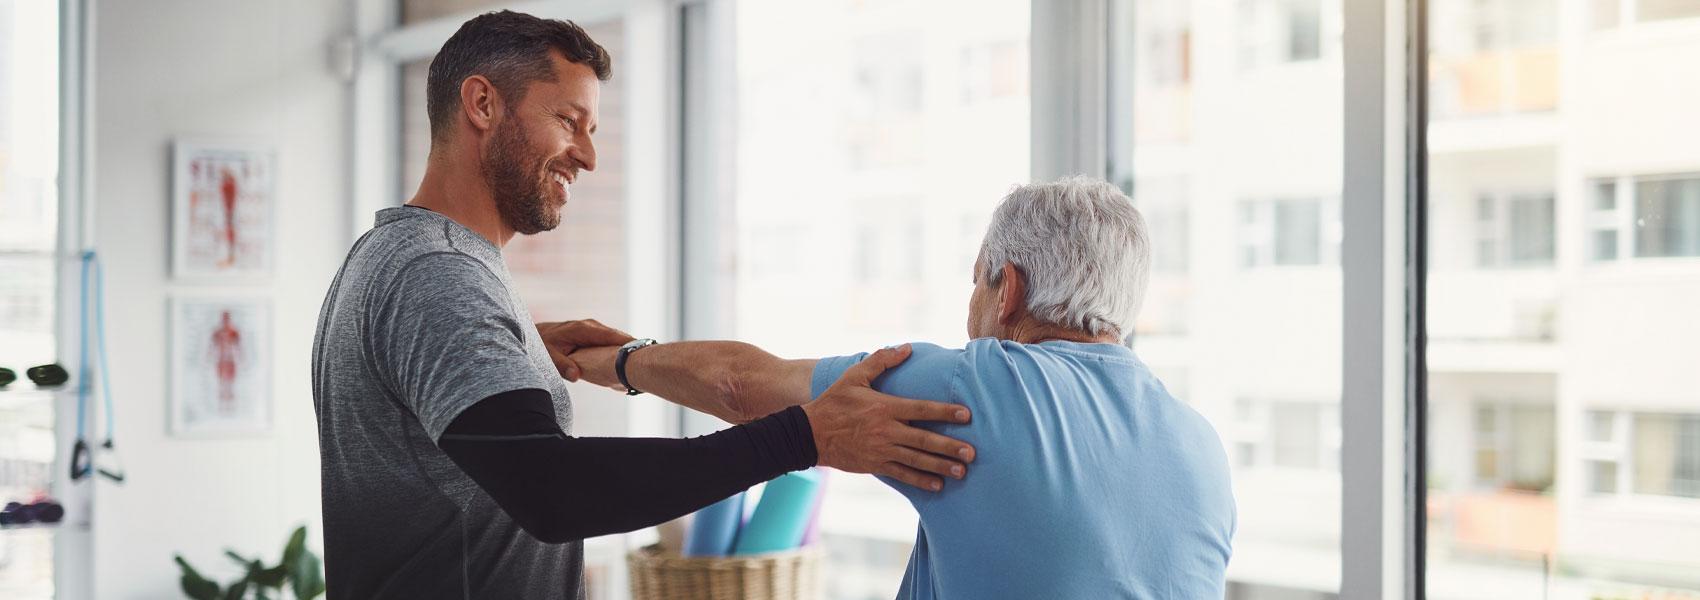 An elderly man receiving rehabilitation services at his senior living community